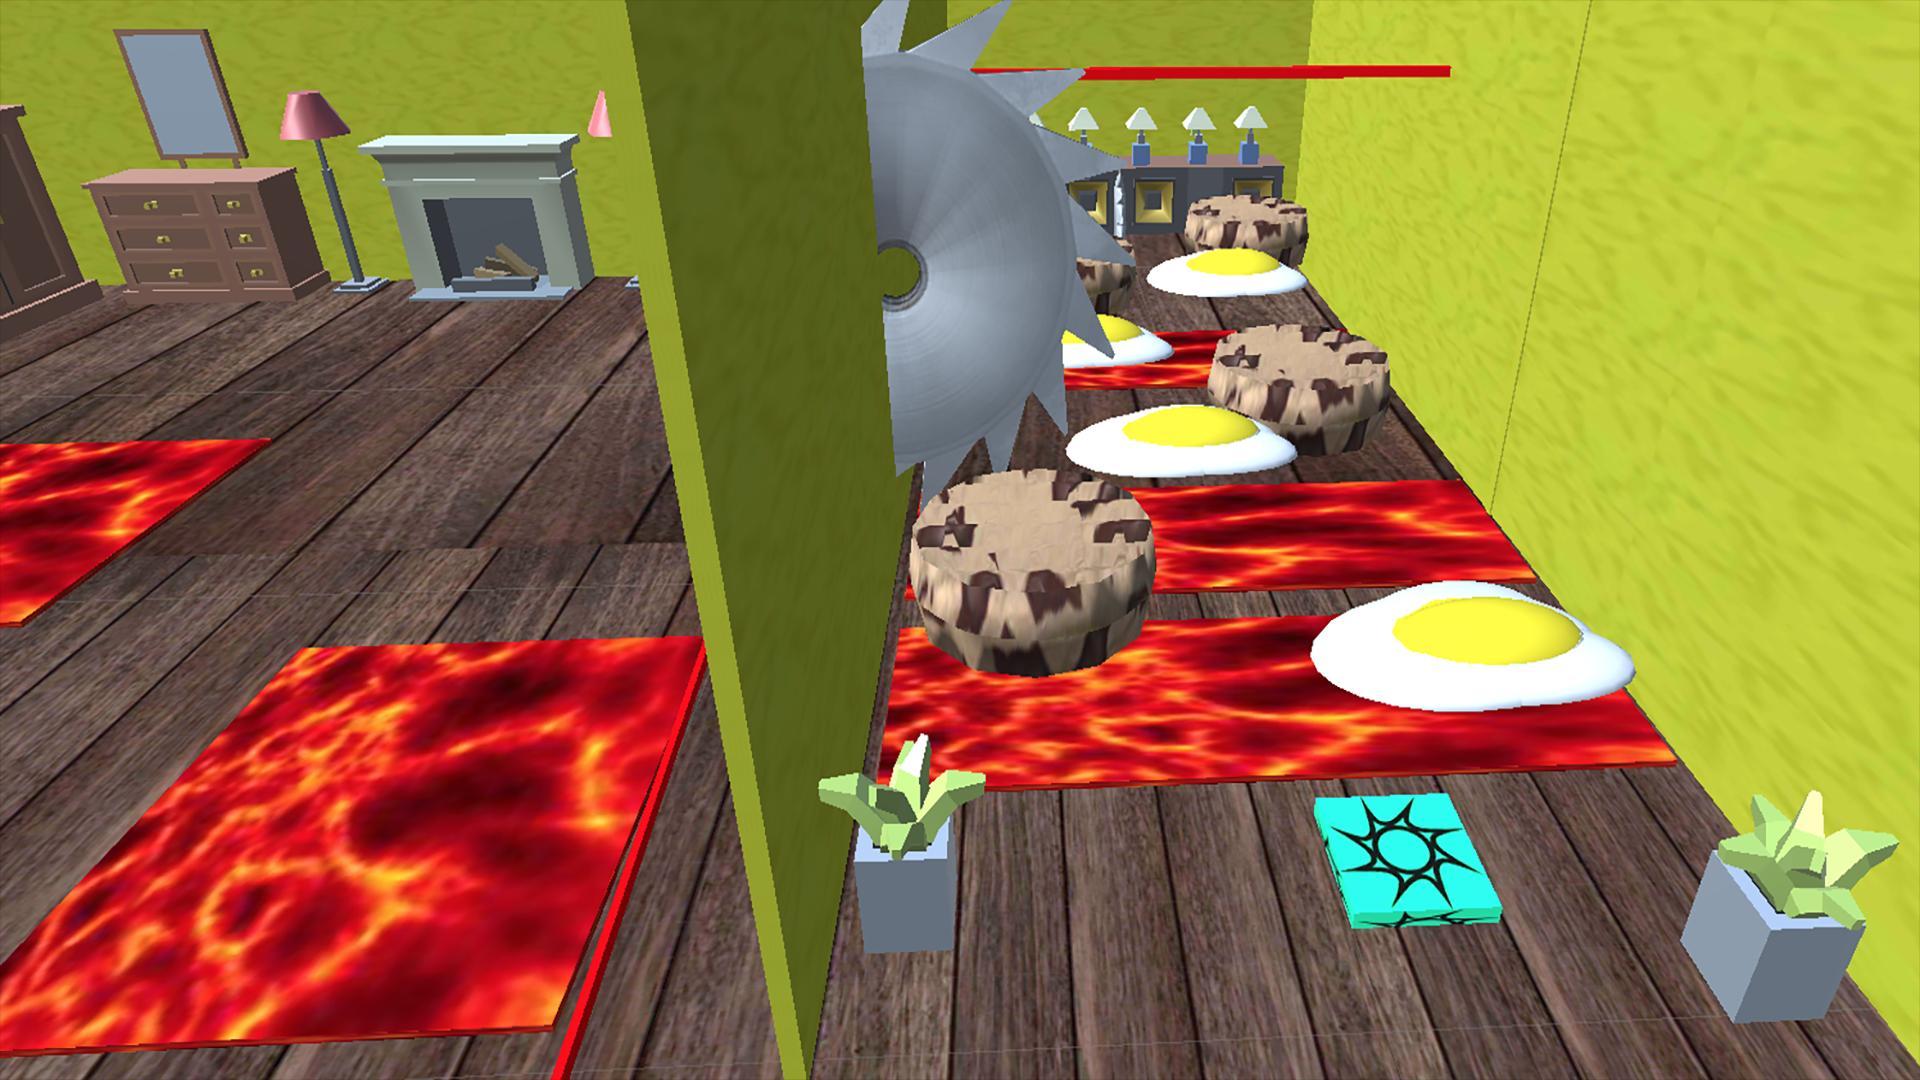 Crazy cookie swirl c robIox adventure 1.2 Screenshot 5